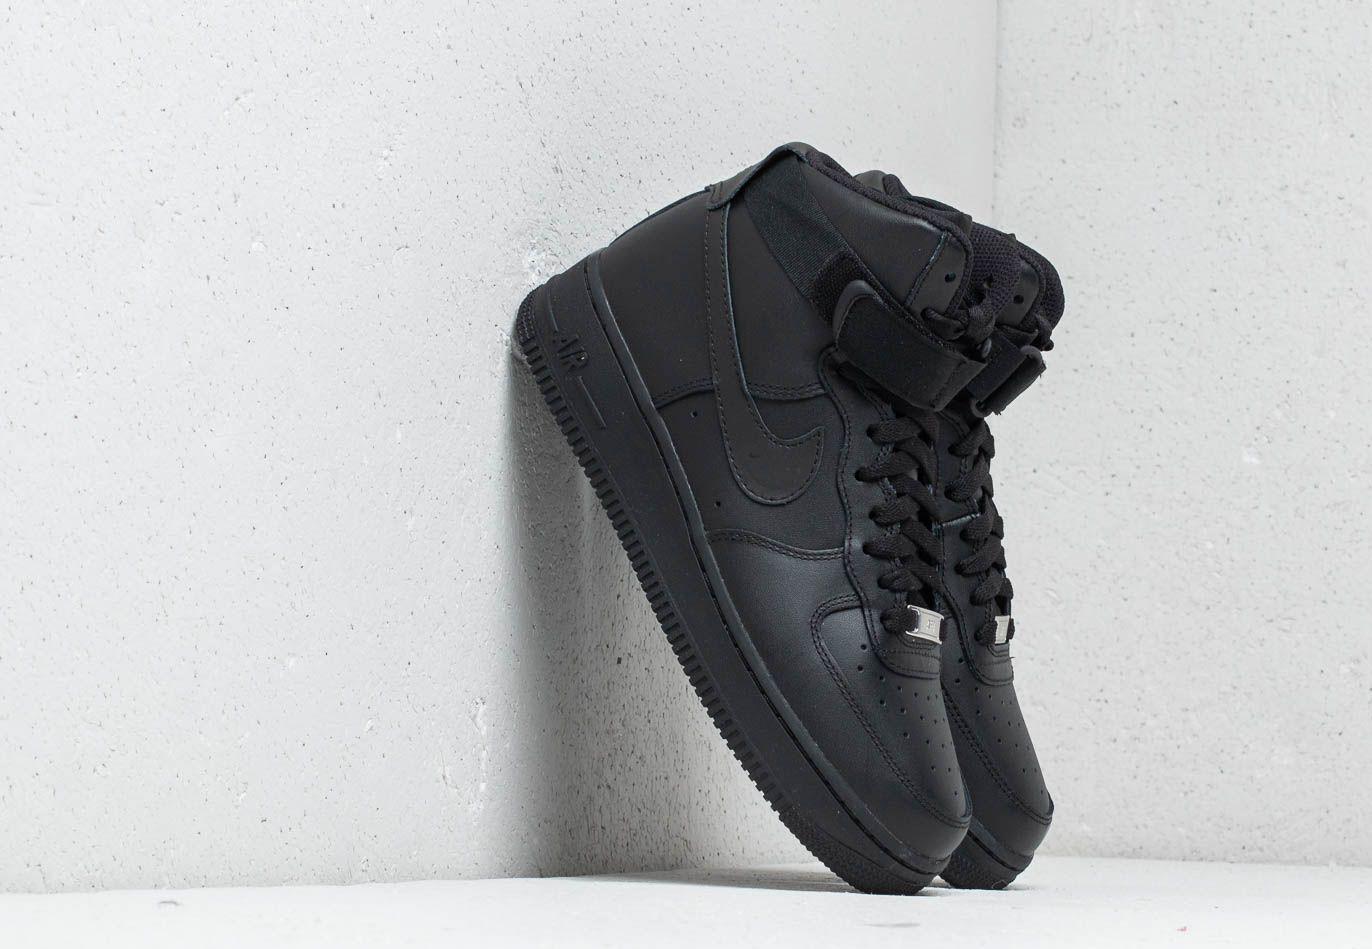 Nike Wmns Air Force 1 High Black/ Black-Black 334031-013